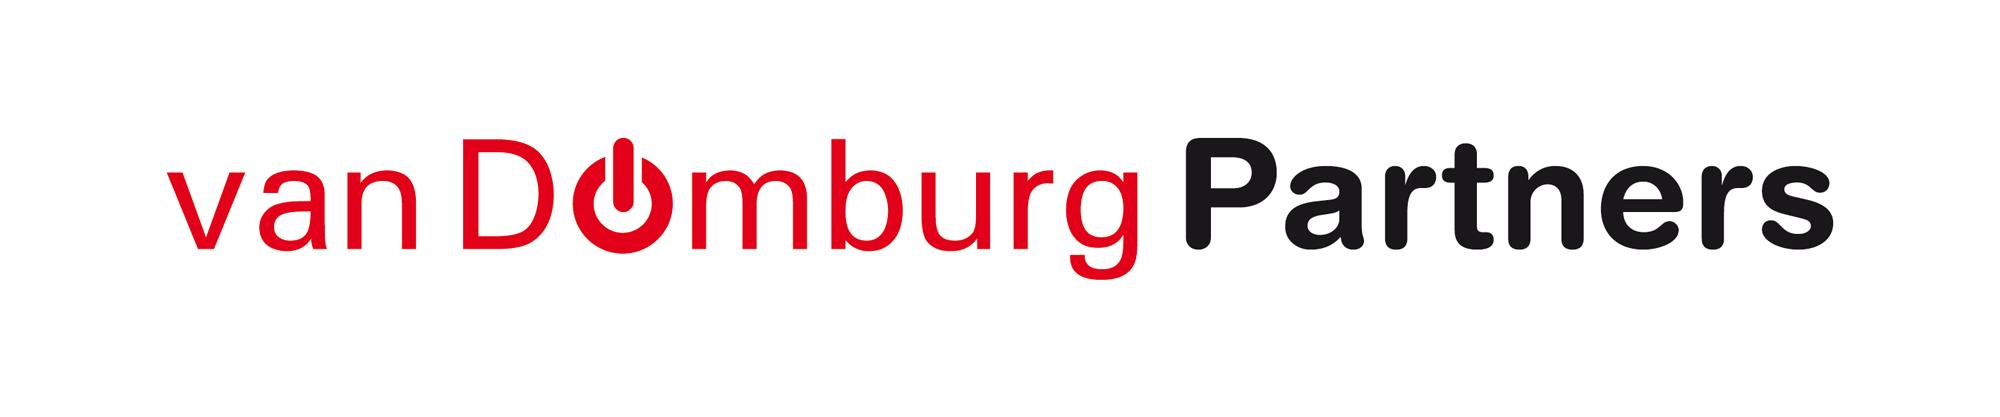 van Domburg Partners